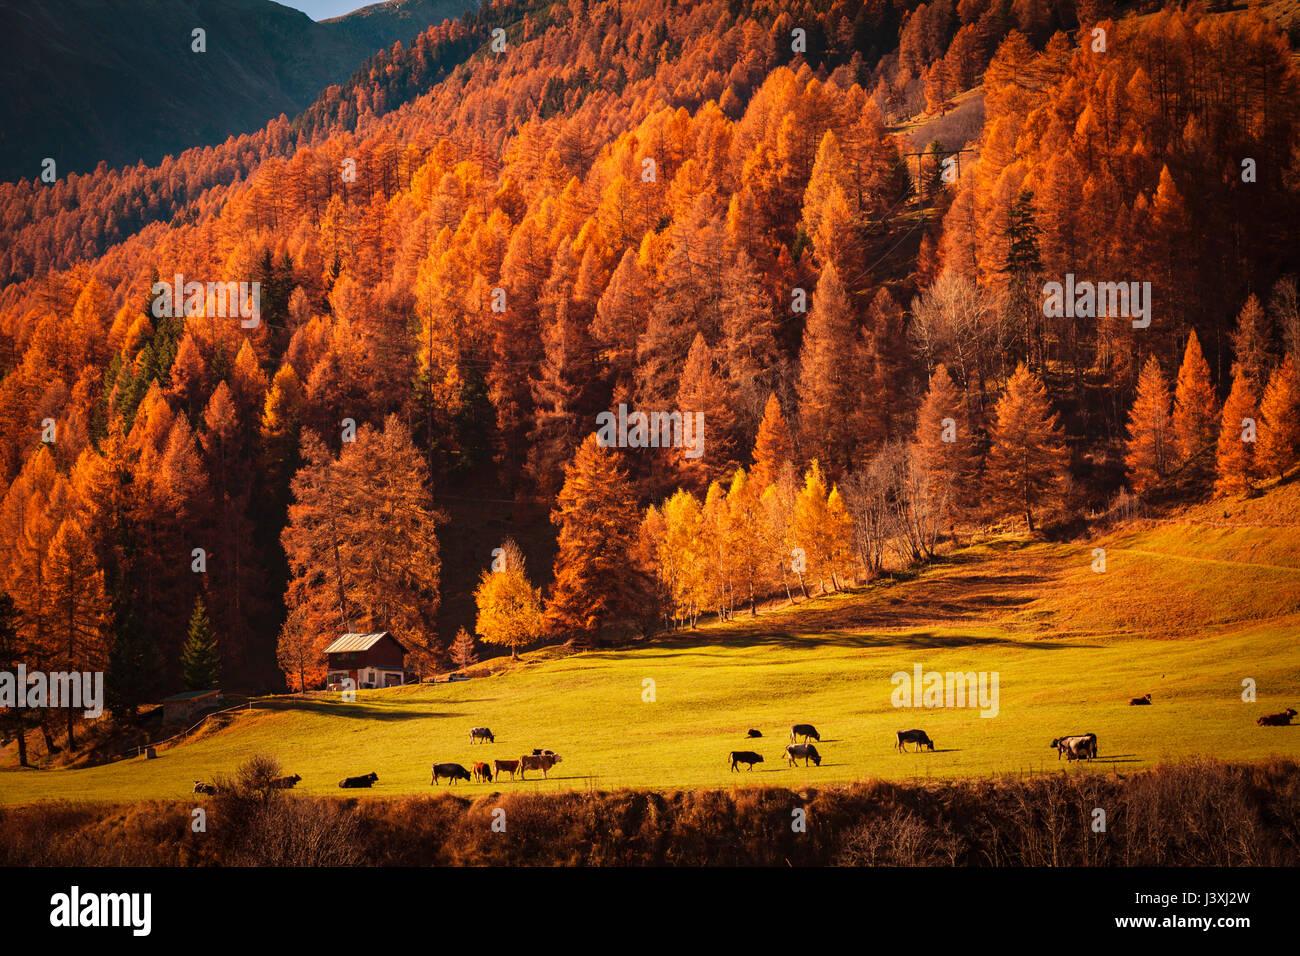 Scenic view, Engadin, Saint Moritz, Switzerland - Stock Image